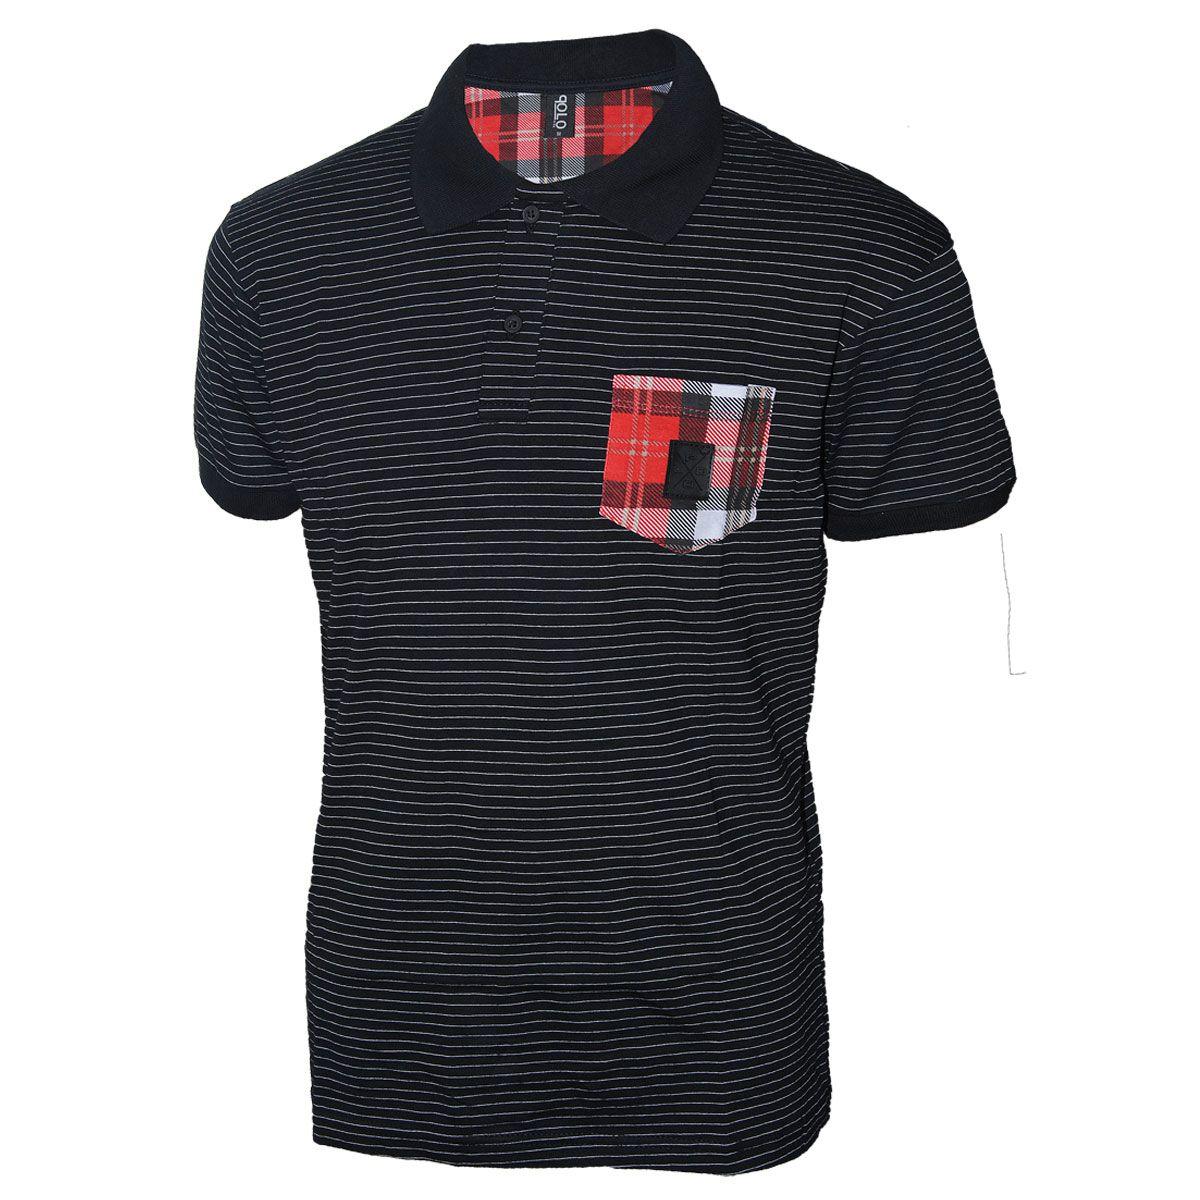 Camisa Gola Polo Rg518